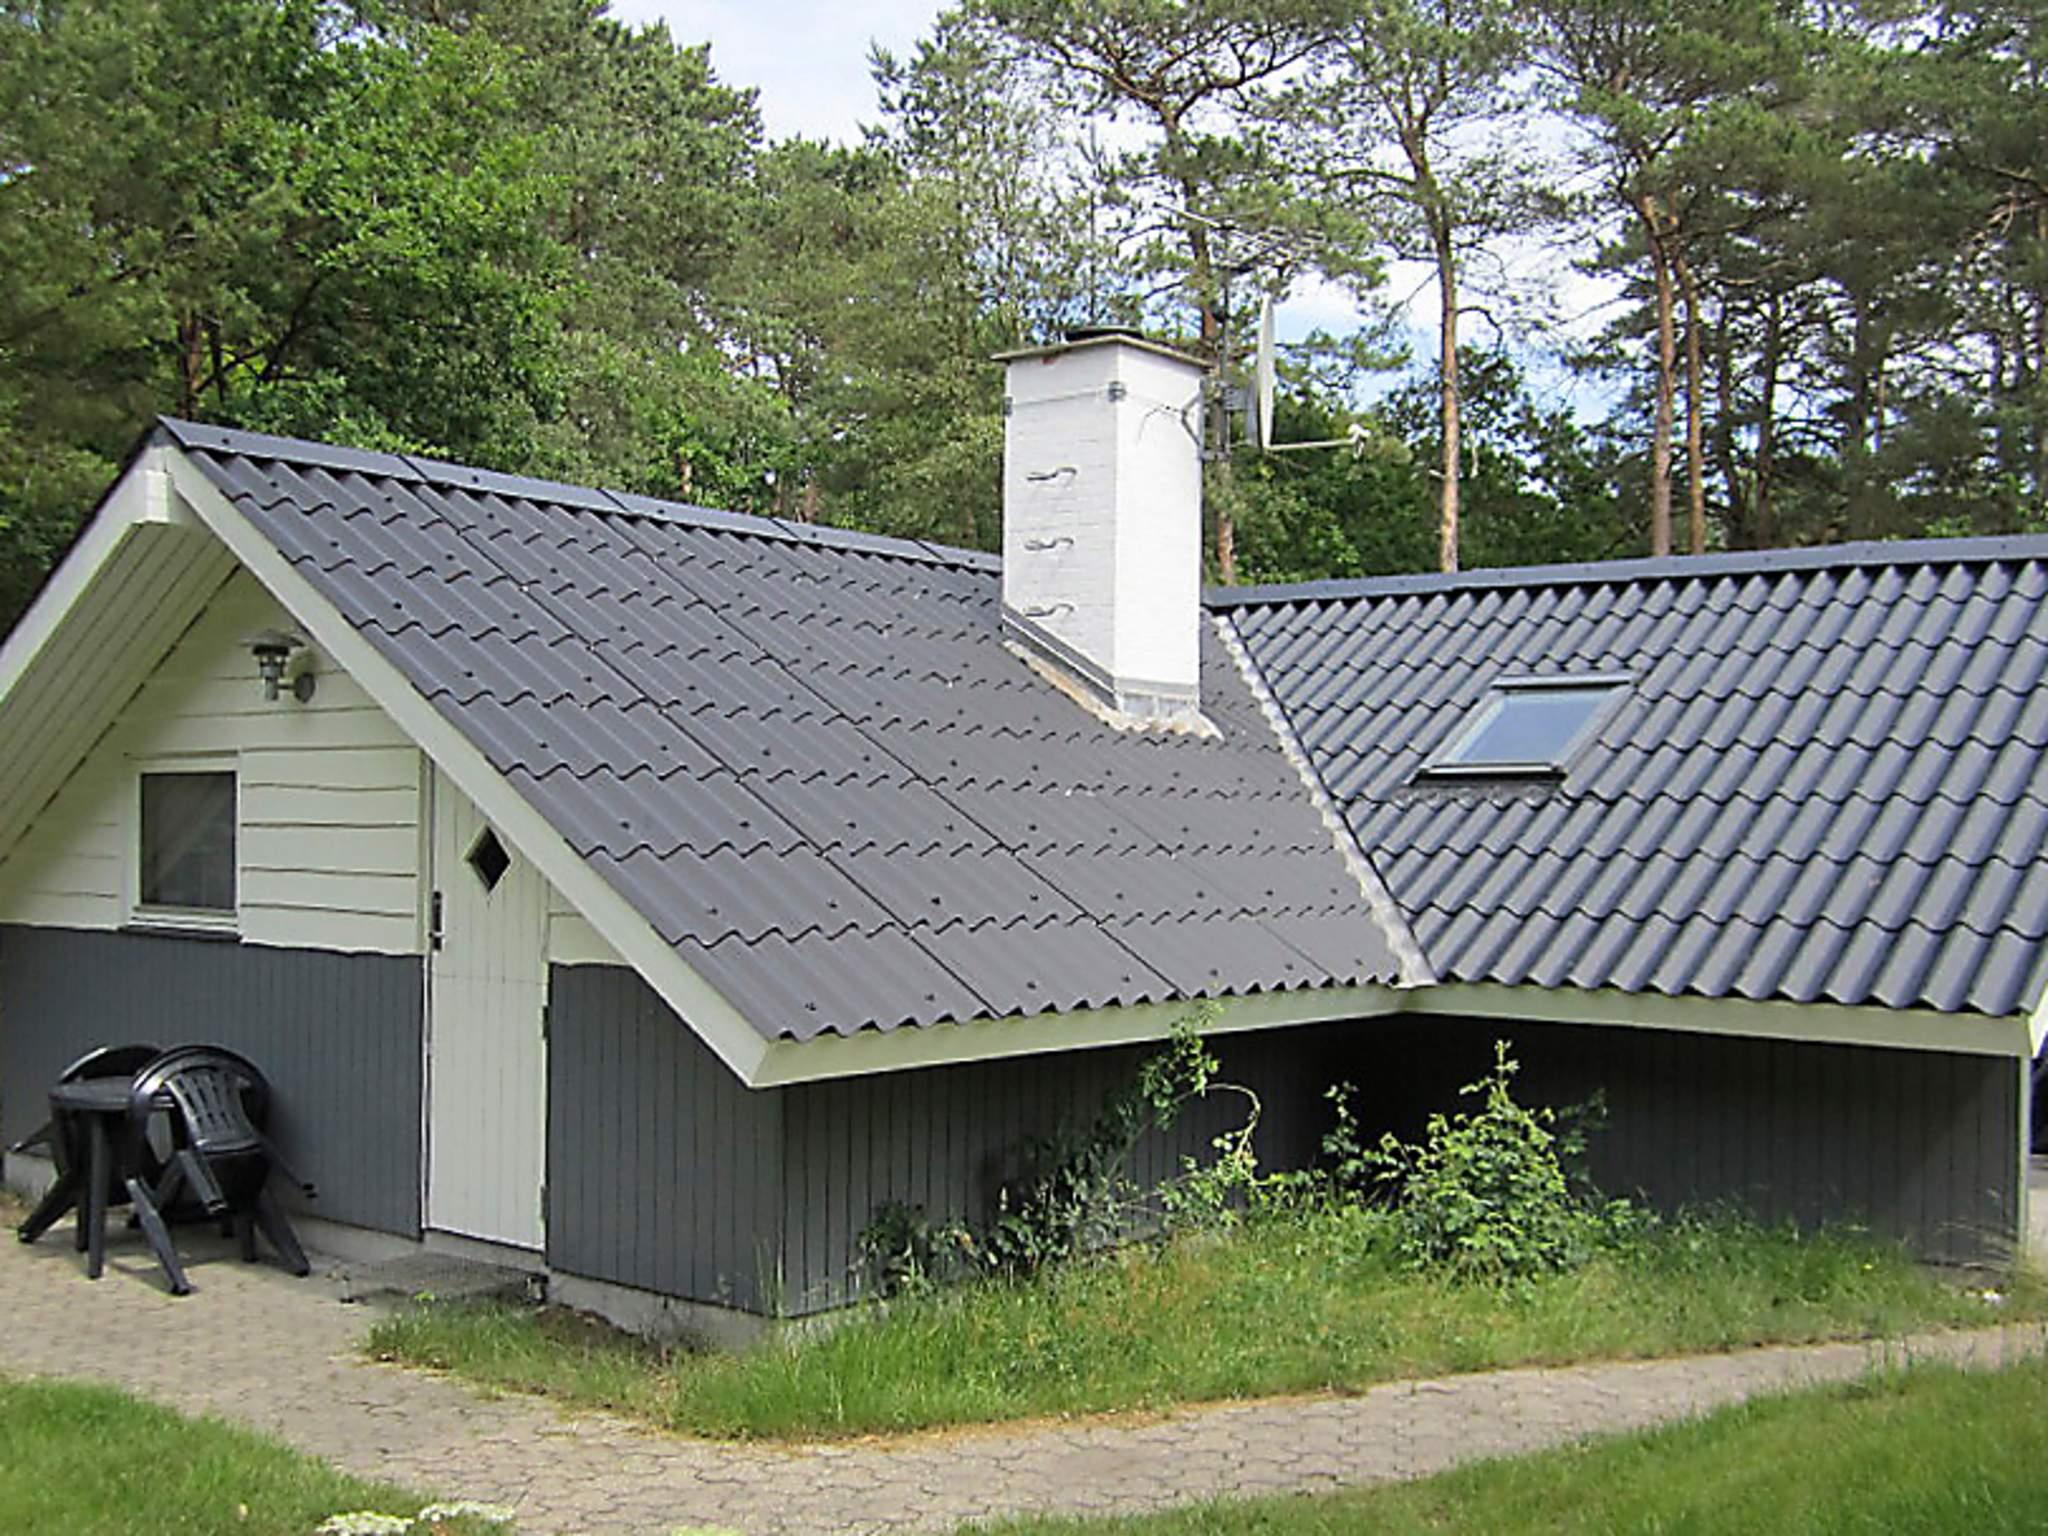 Ferienhaus Hou Nord/Melholt (88048), Hou, , Nordostjütland, Dänemark, Bild 35